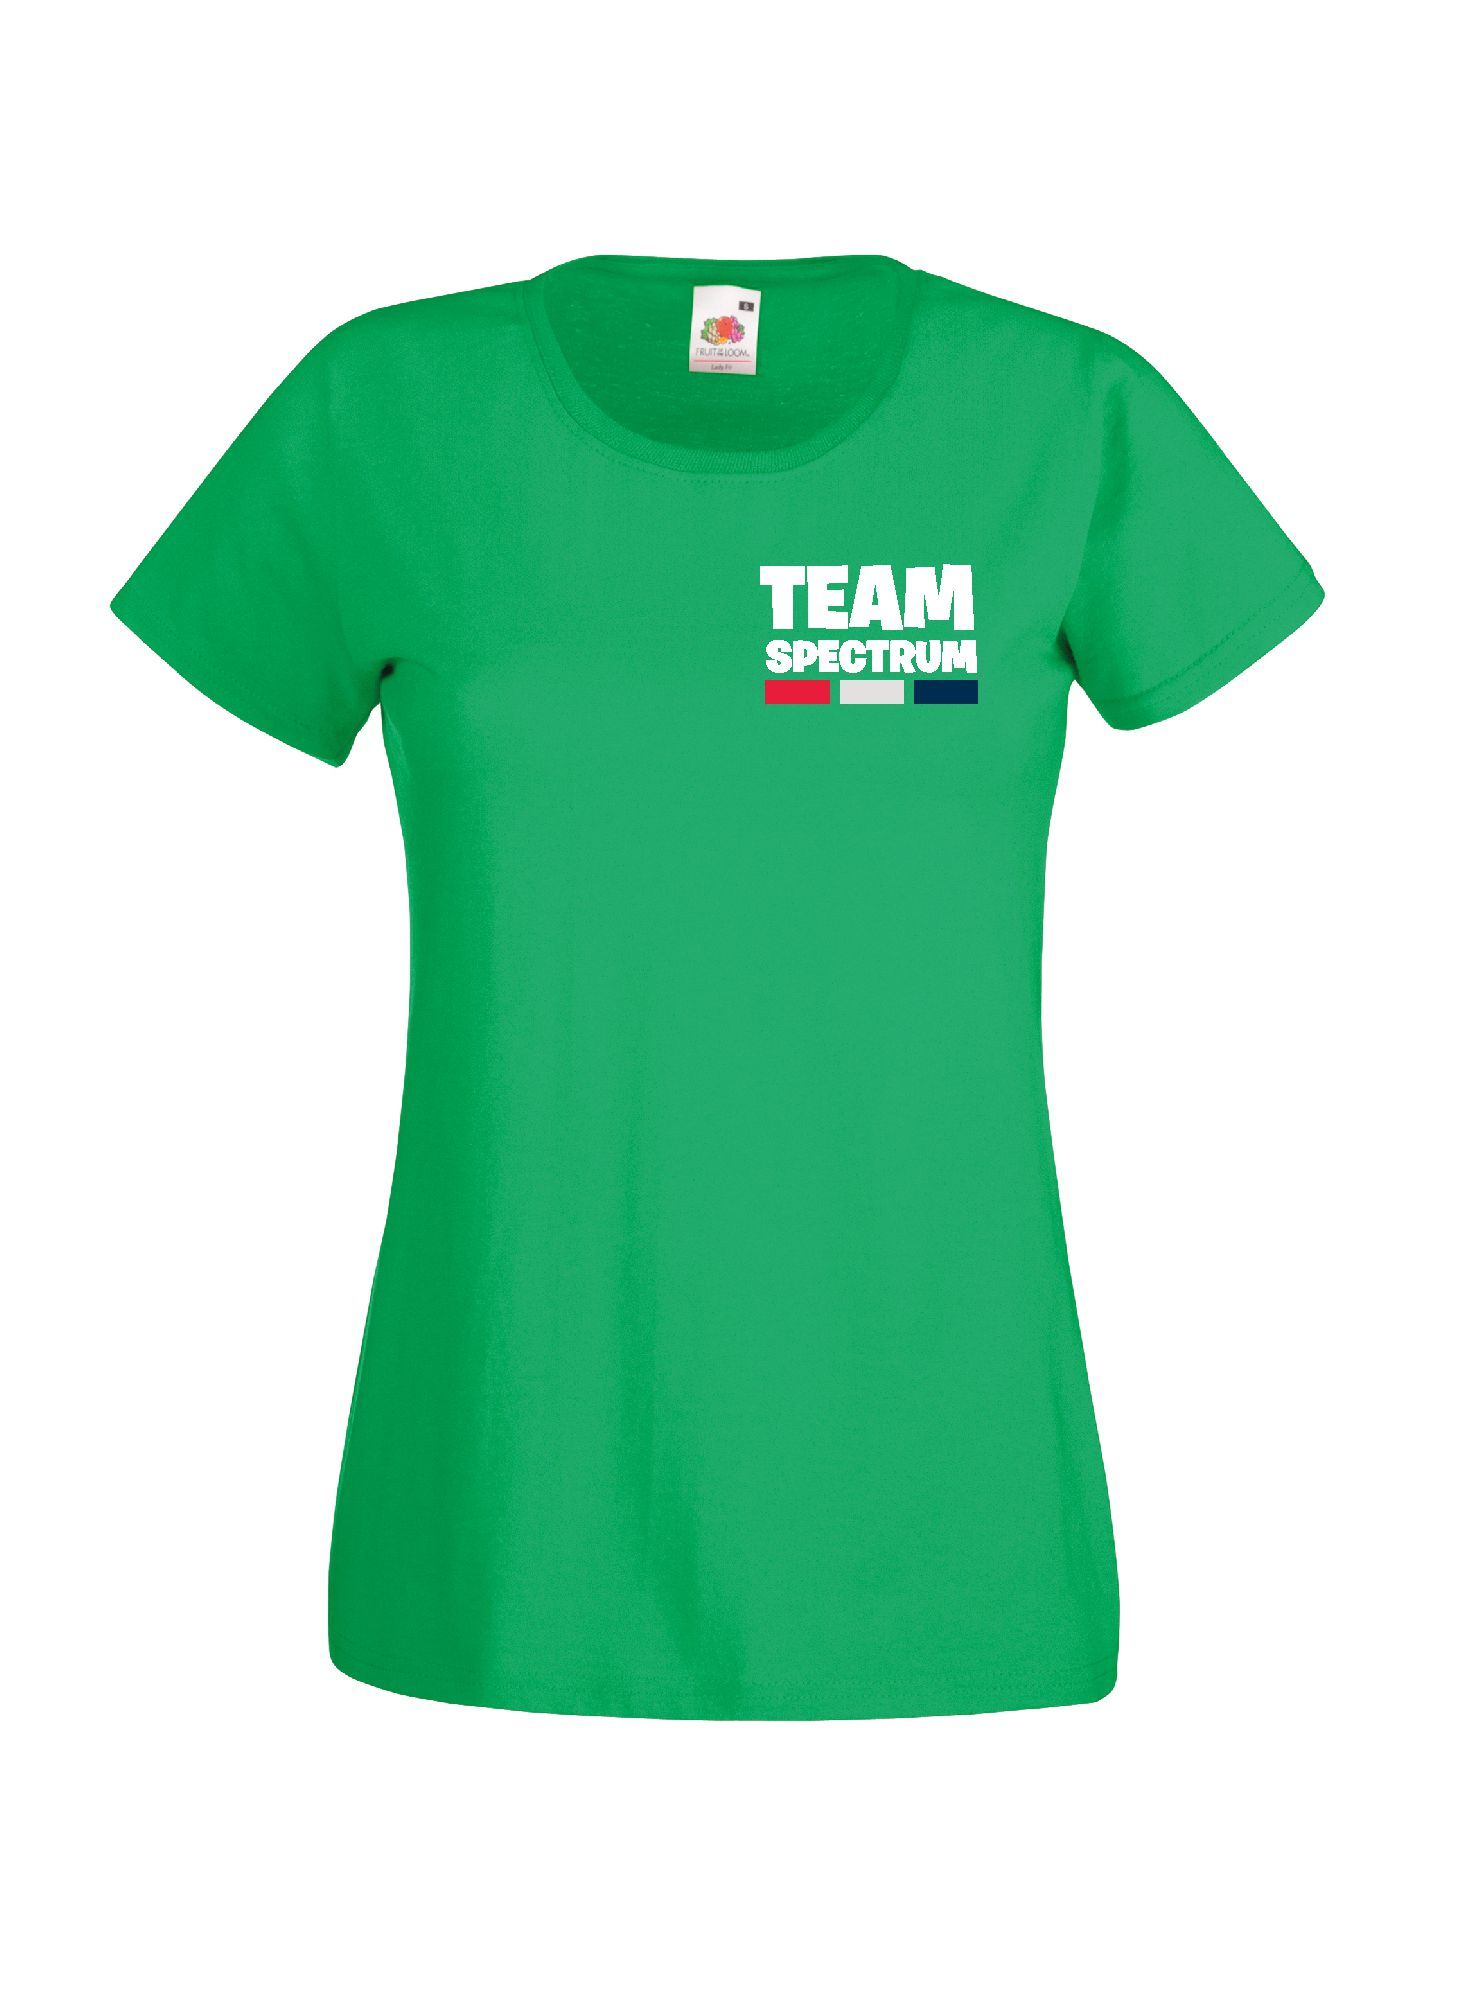 Team Spectrum - Tee (Ladies)